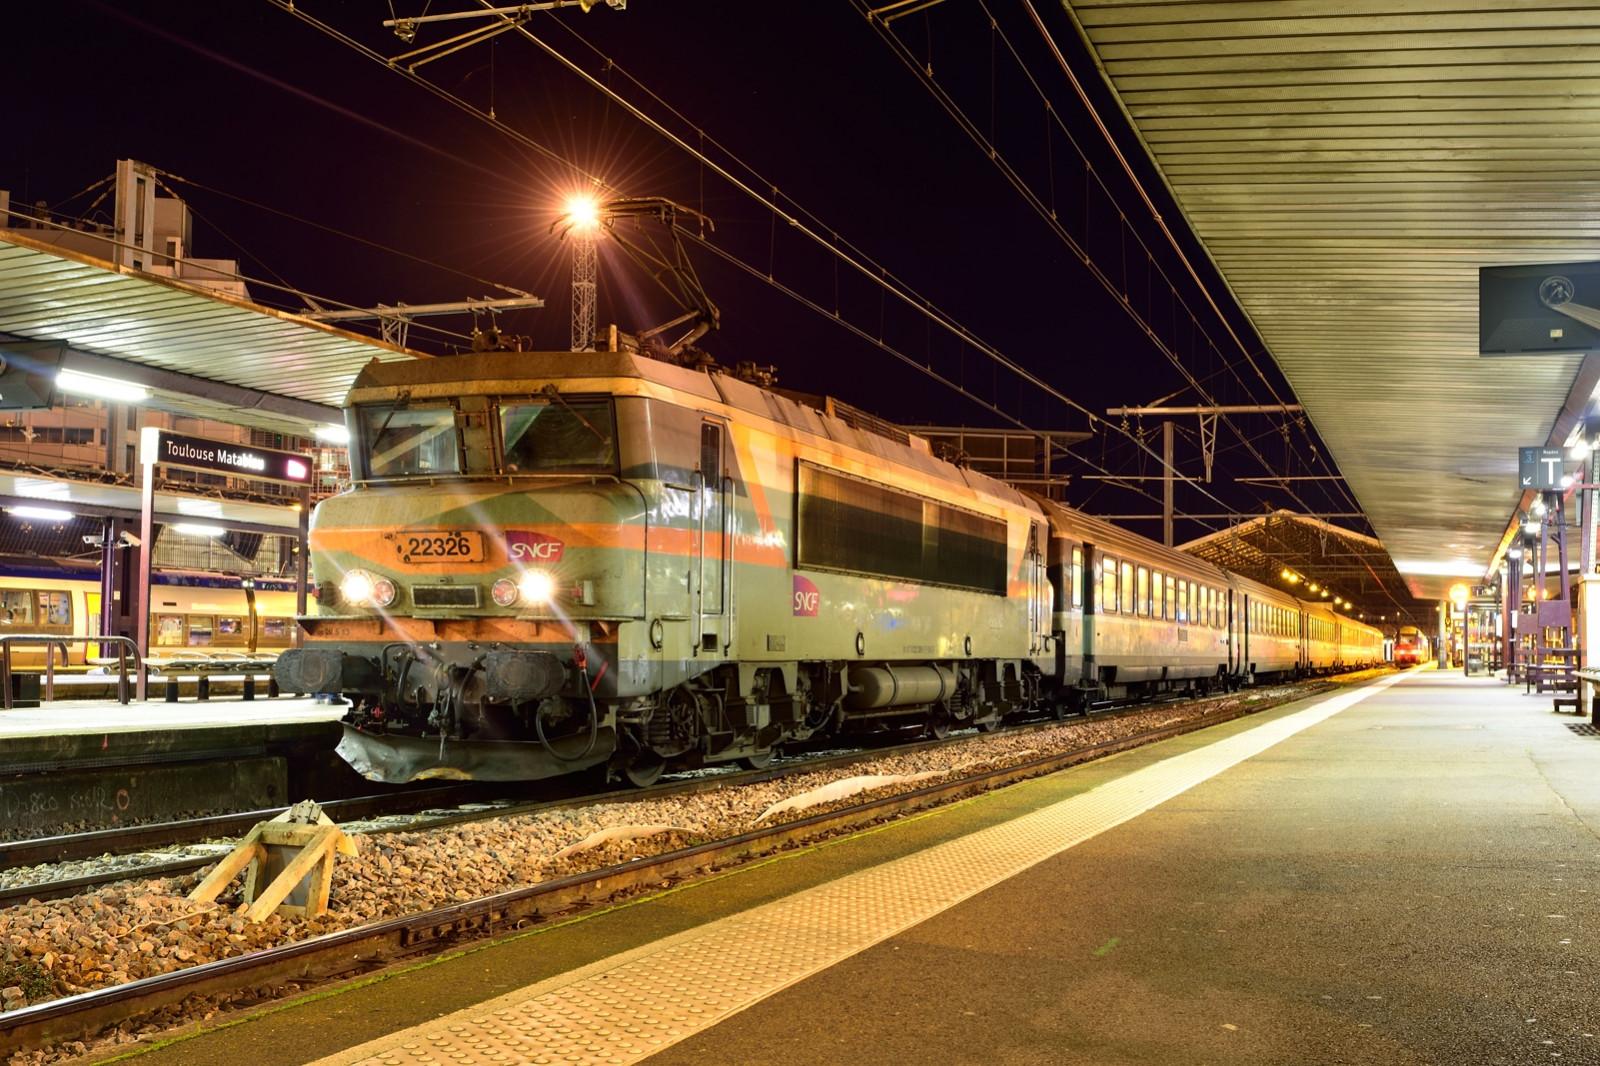 tiger train station surprises - HD1600×1066